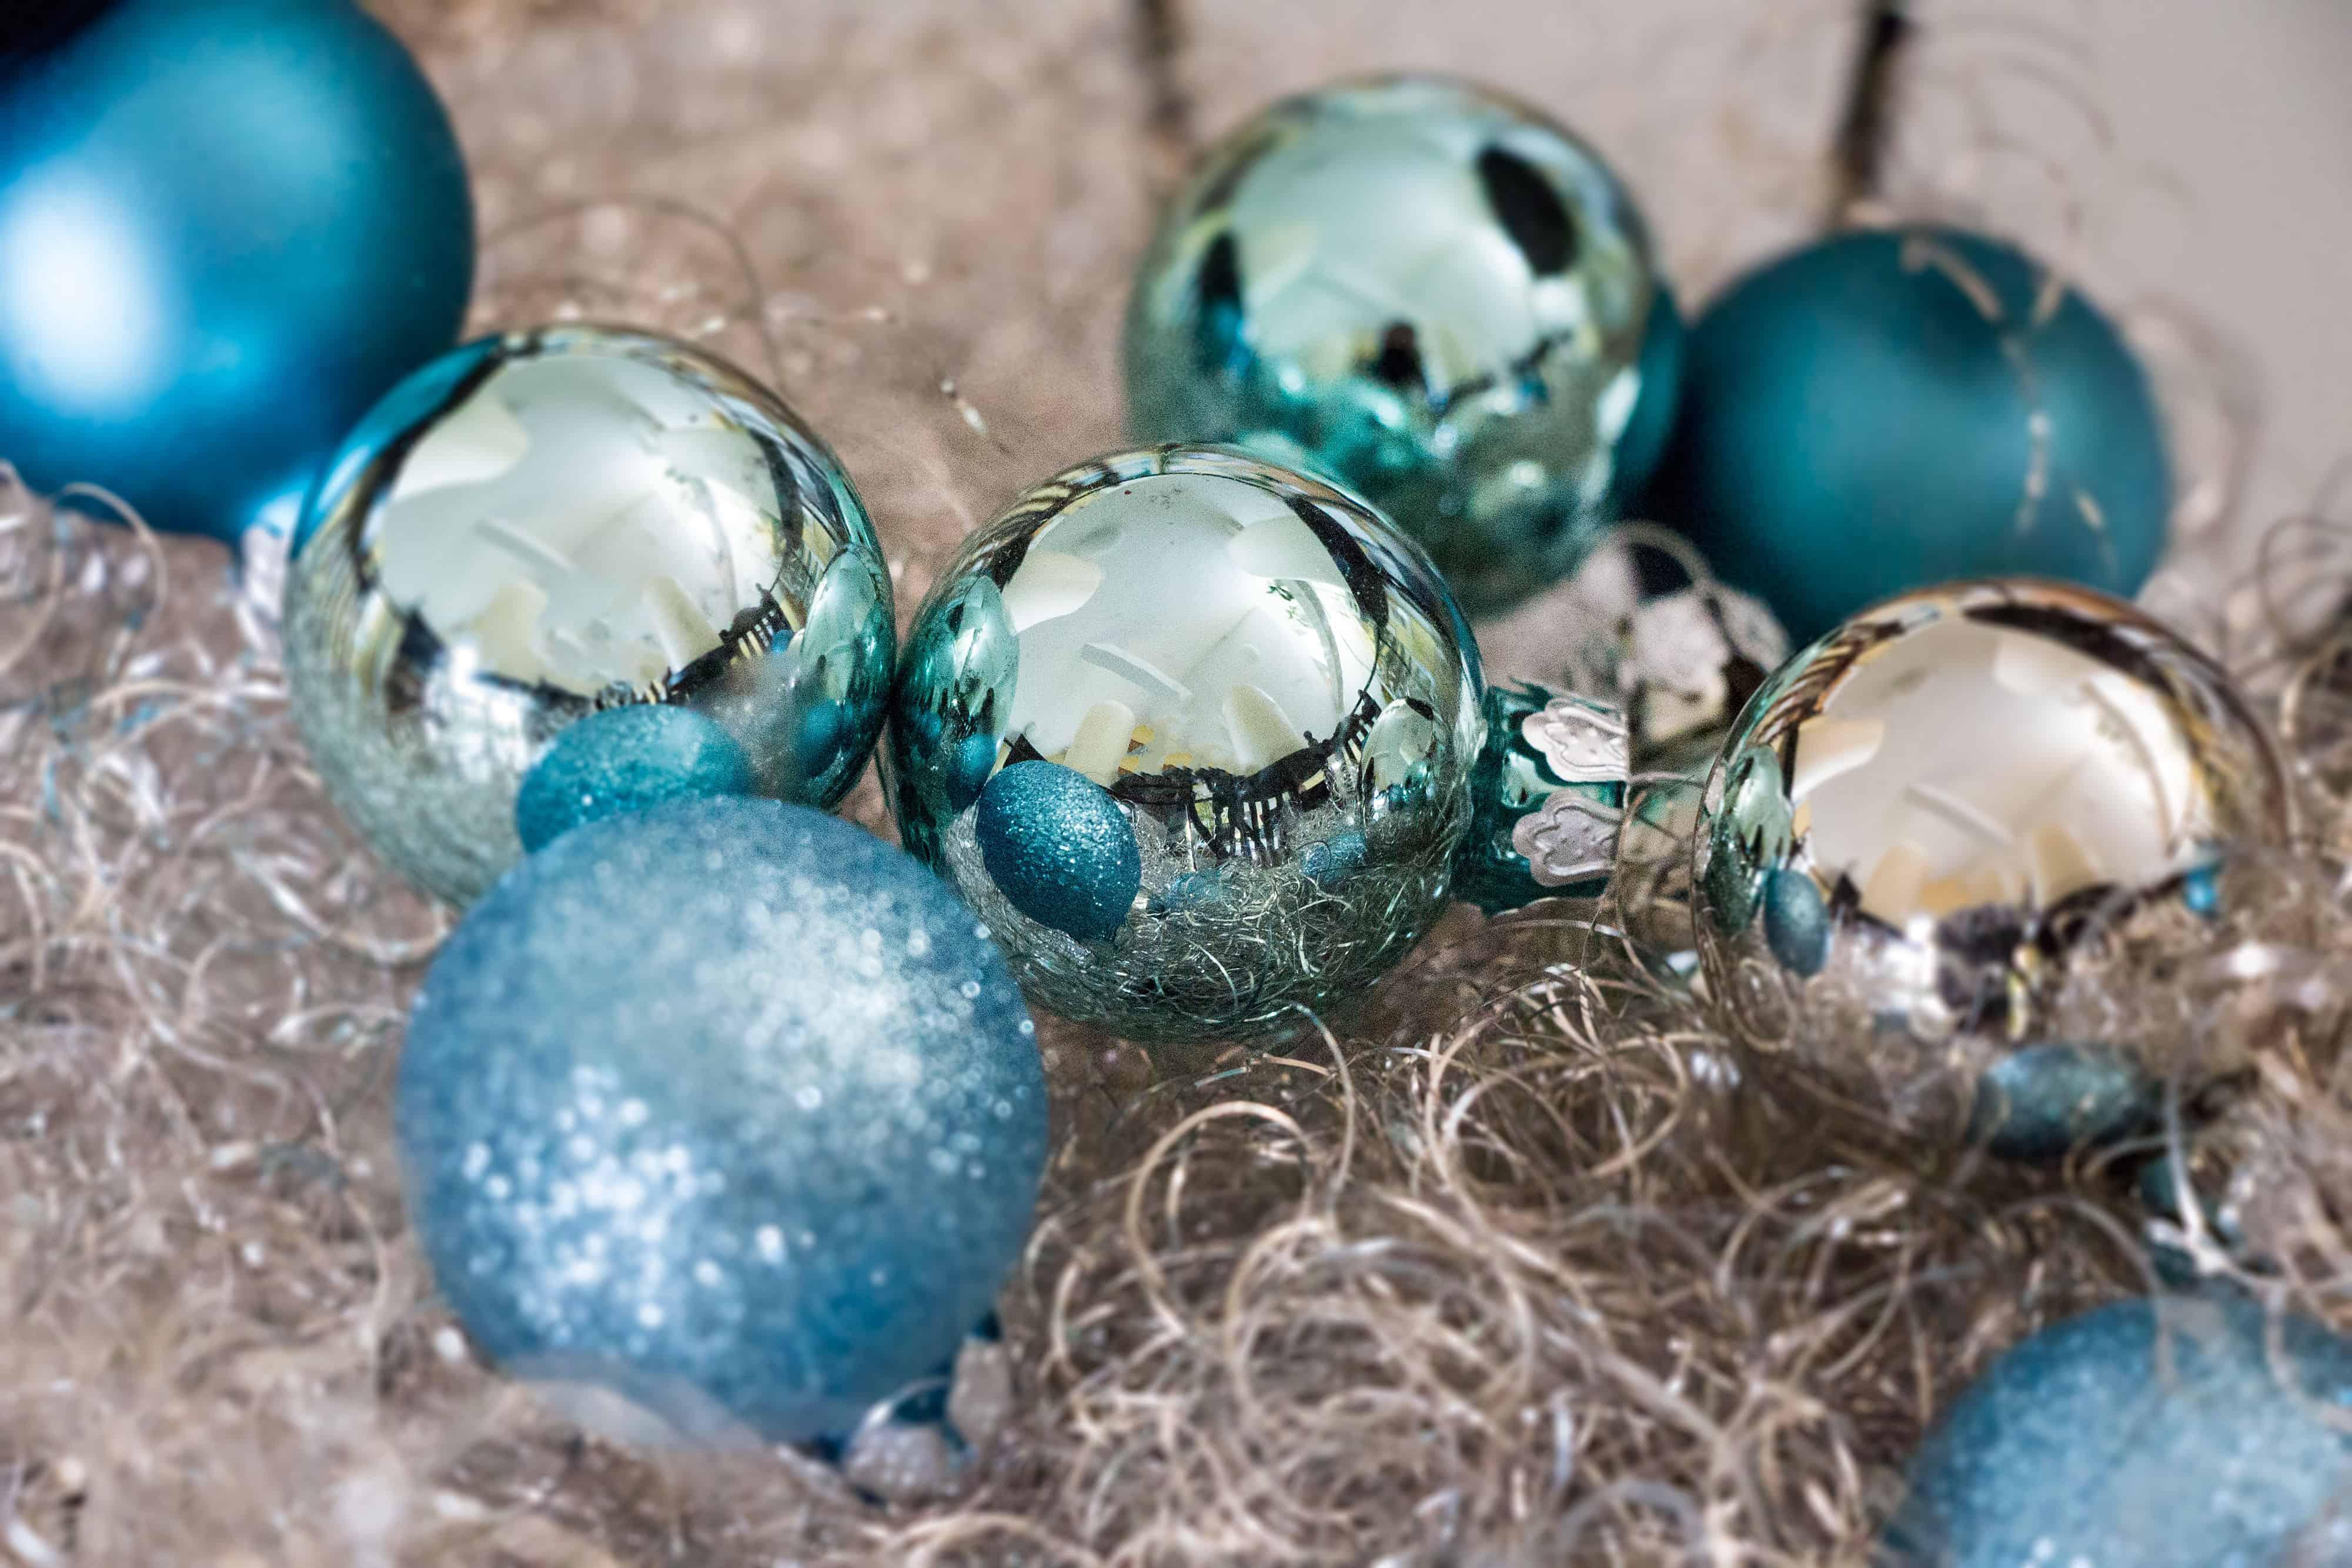 Weihnachtskugeln blau christbaumkugeln in blaut nen - Weihnachtskugeln cappuccino ...